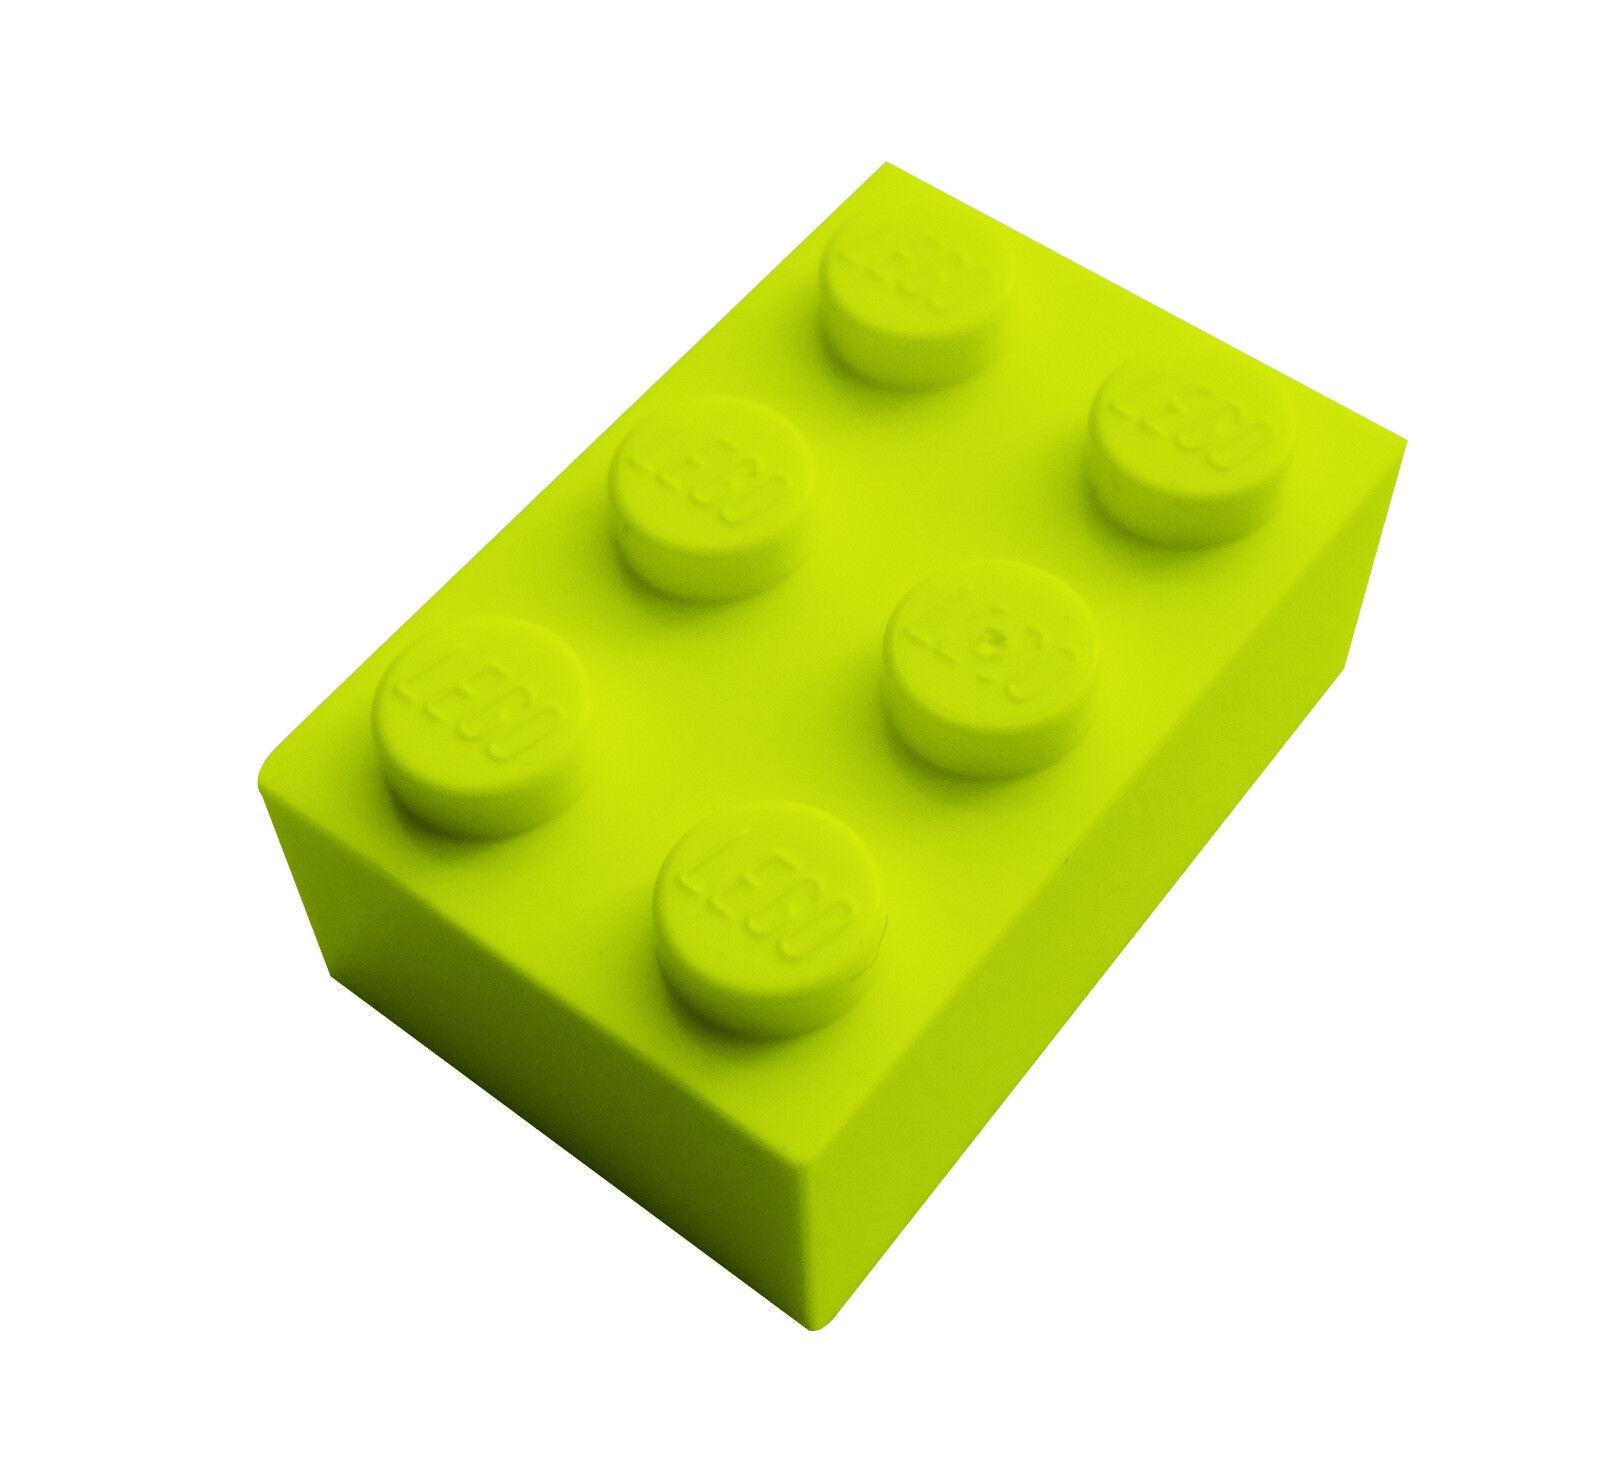 Neu Steine in limette Basics City 3004 Lego 100 lime grüne Basic Steine 1x2